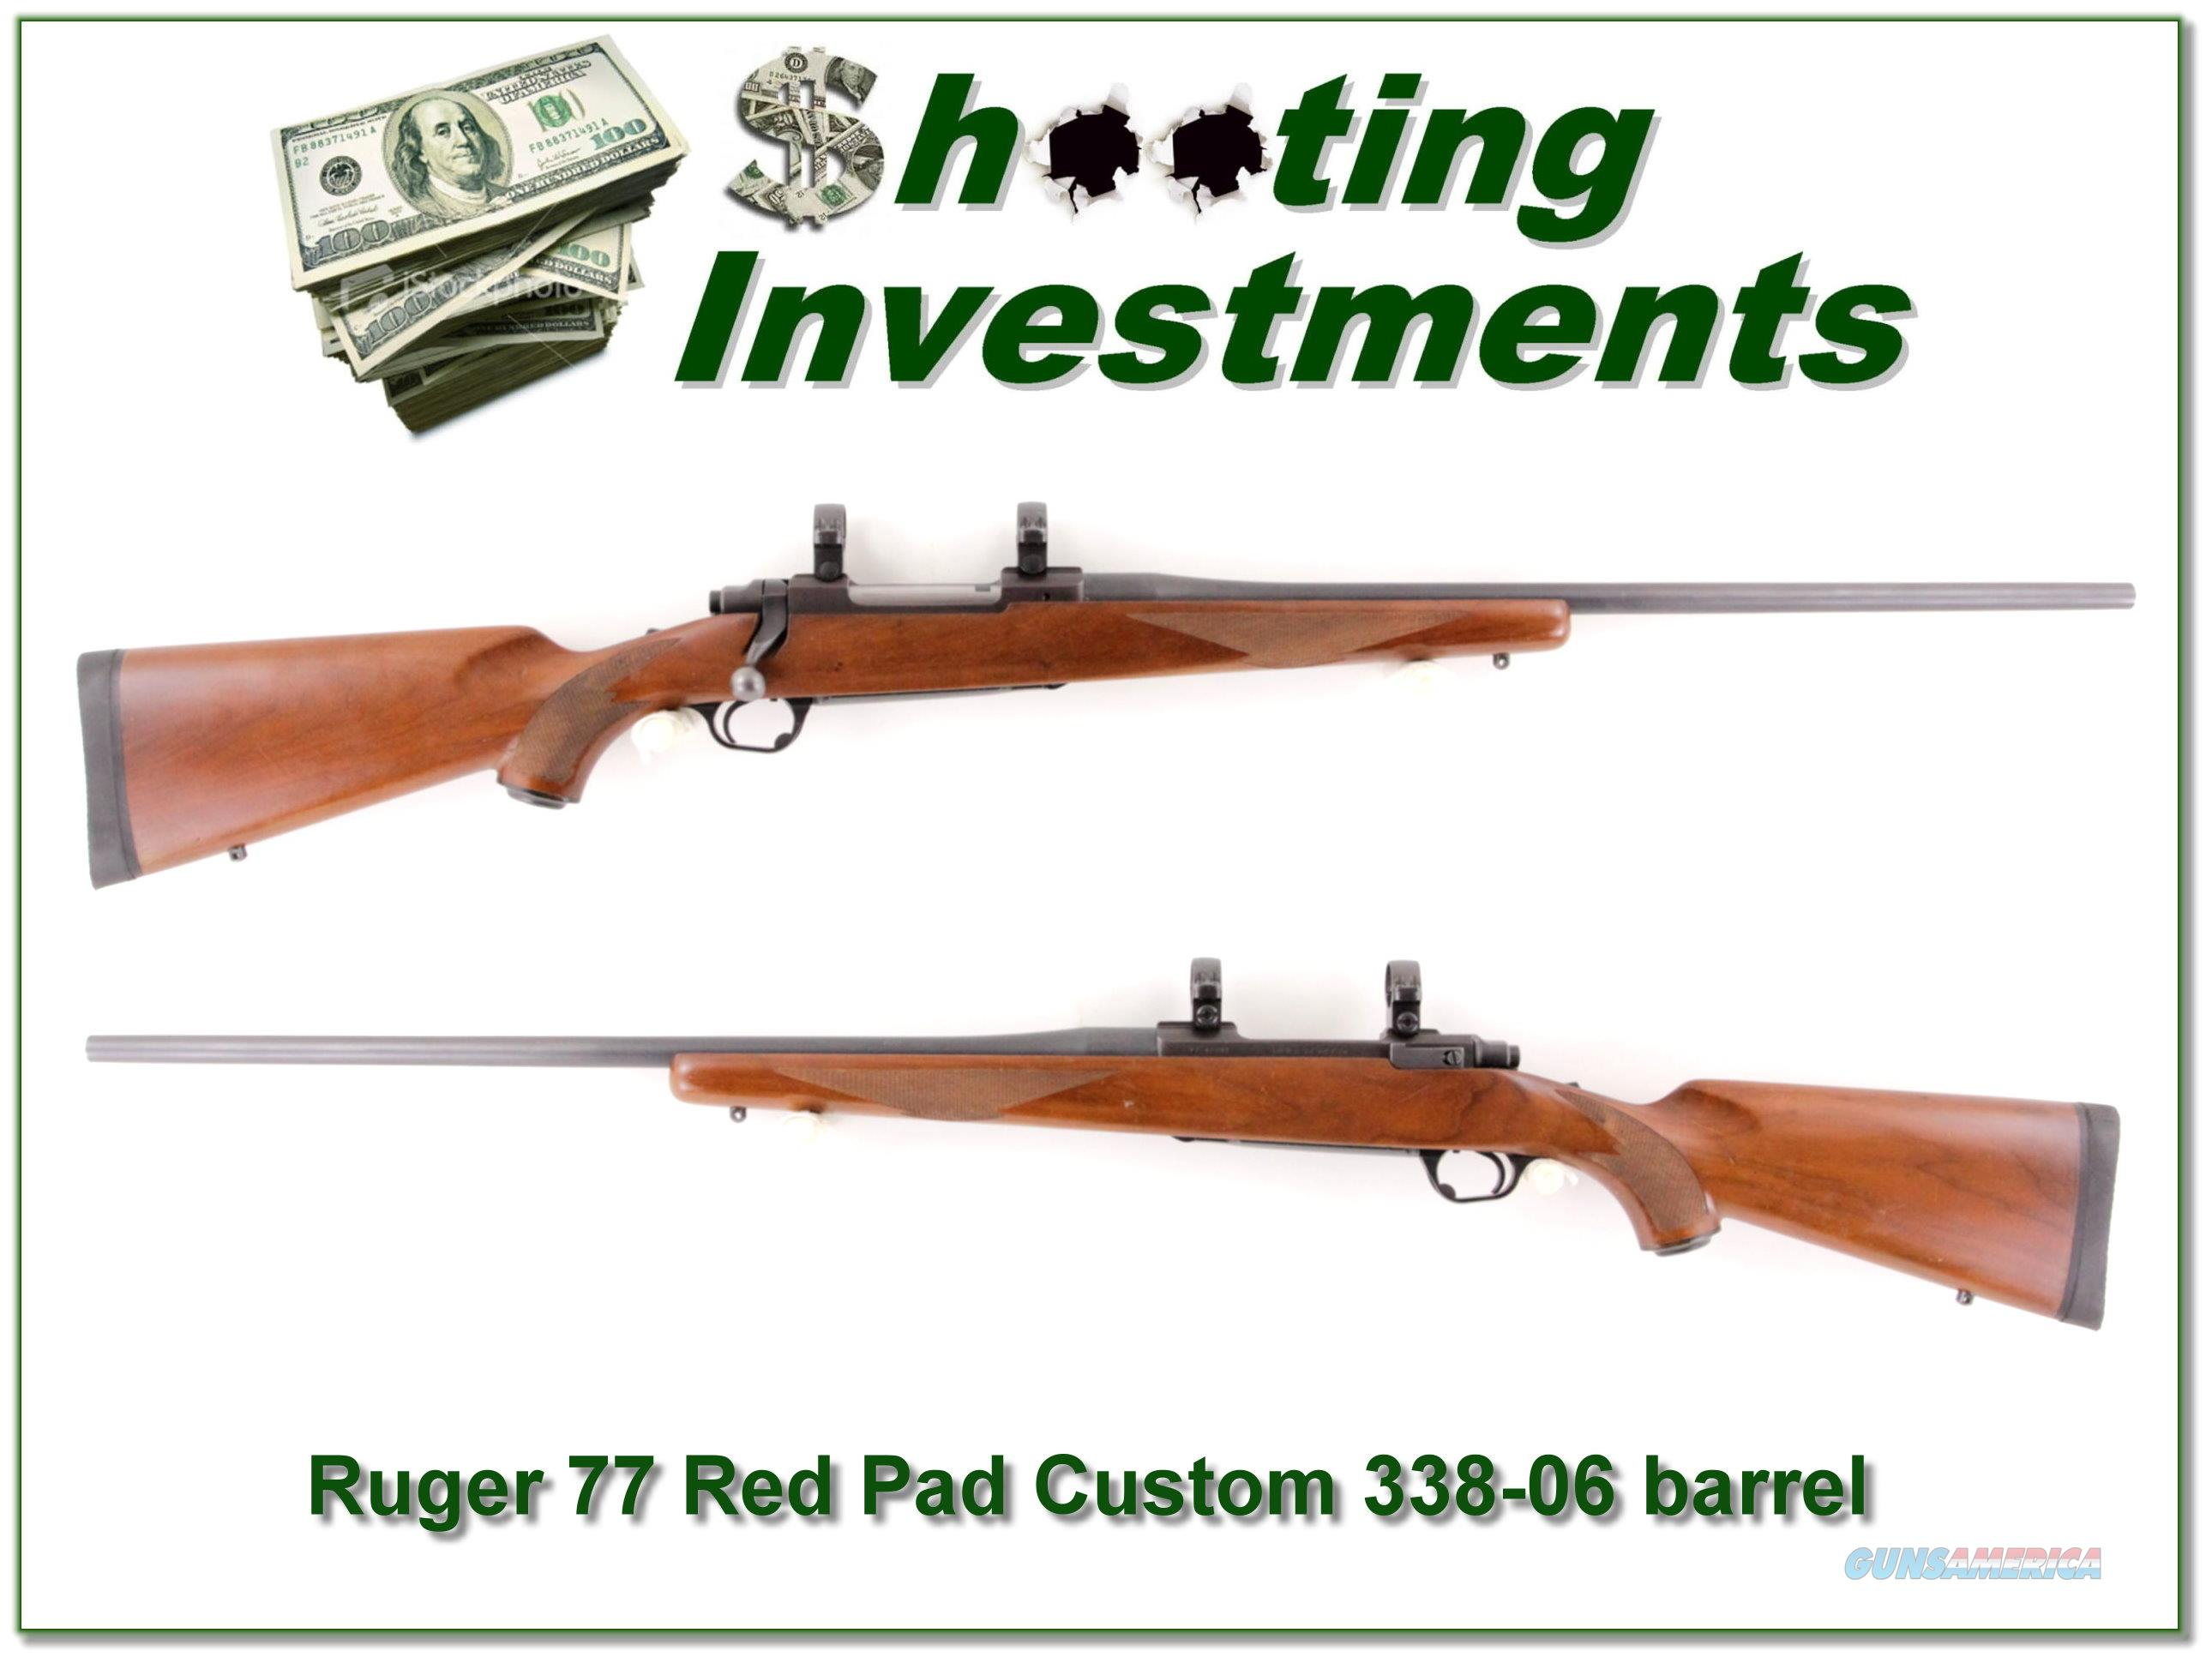 Ruger 77 Red Pad Custom 338-06  Guns > Rifles > Ruger Rifles > Model 77